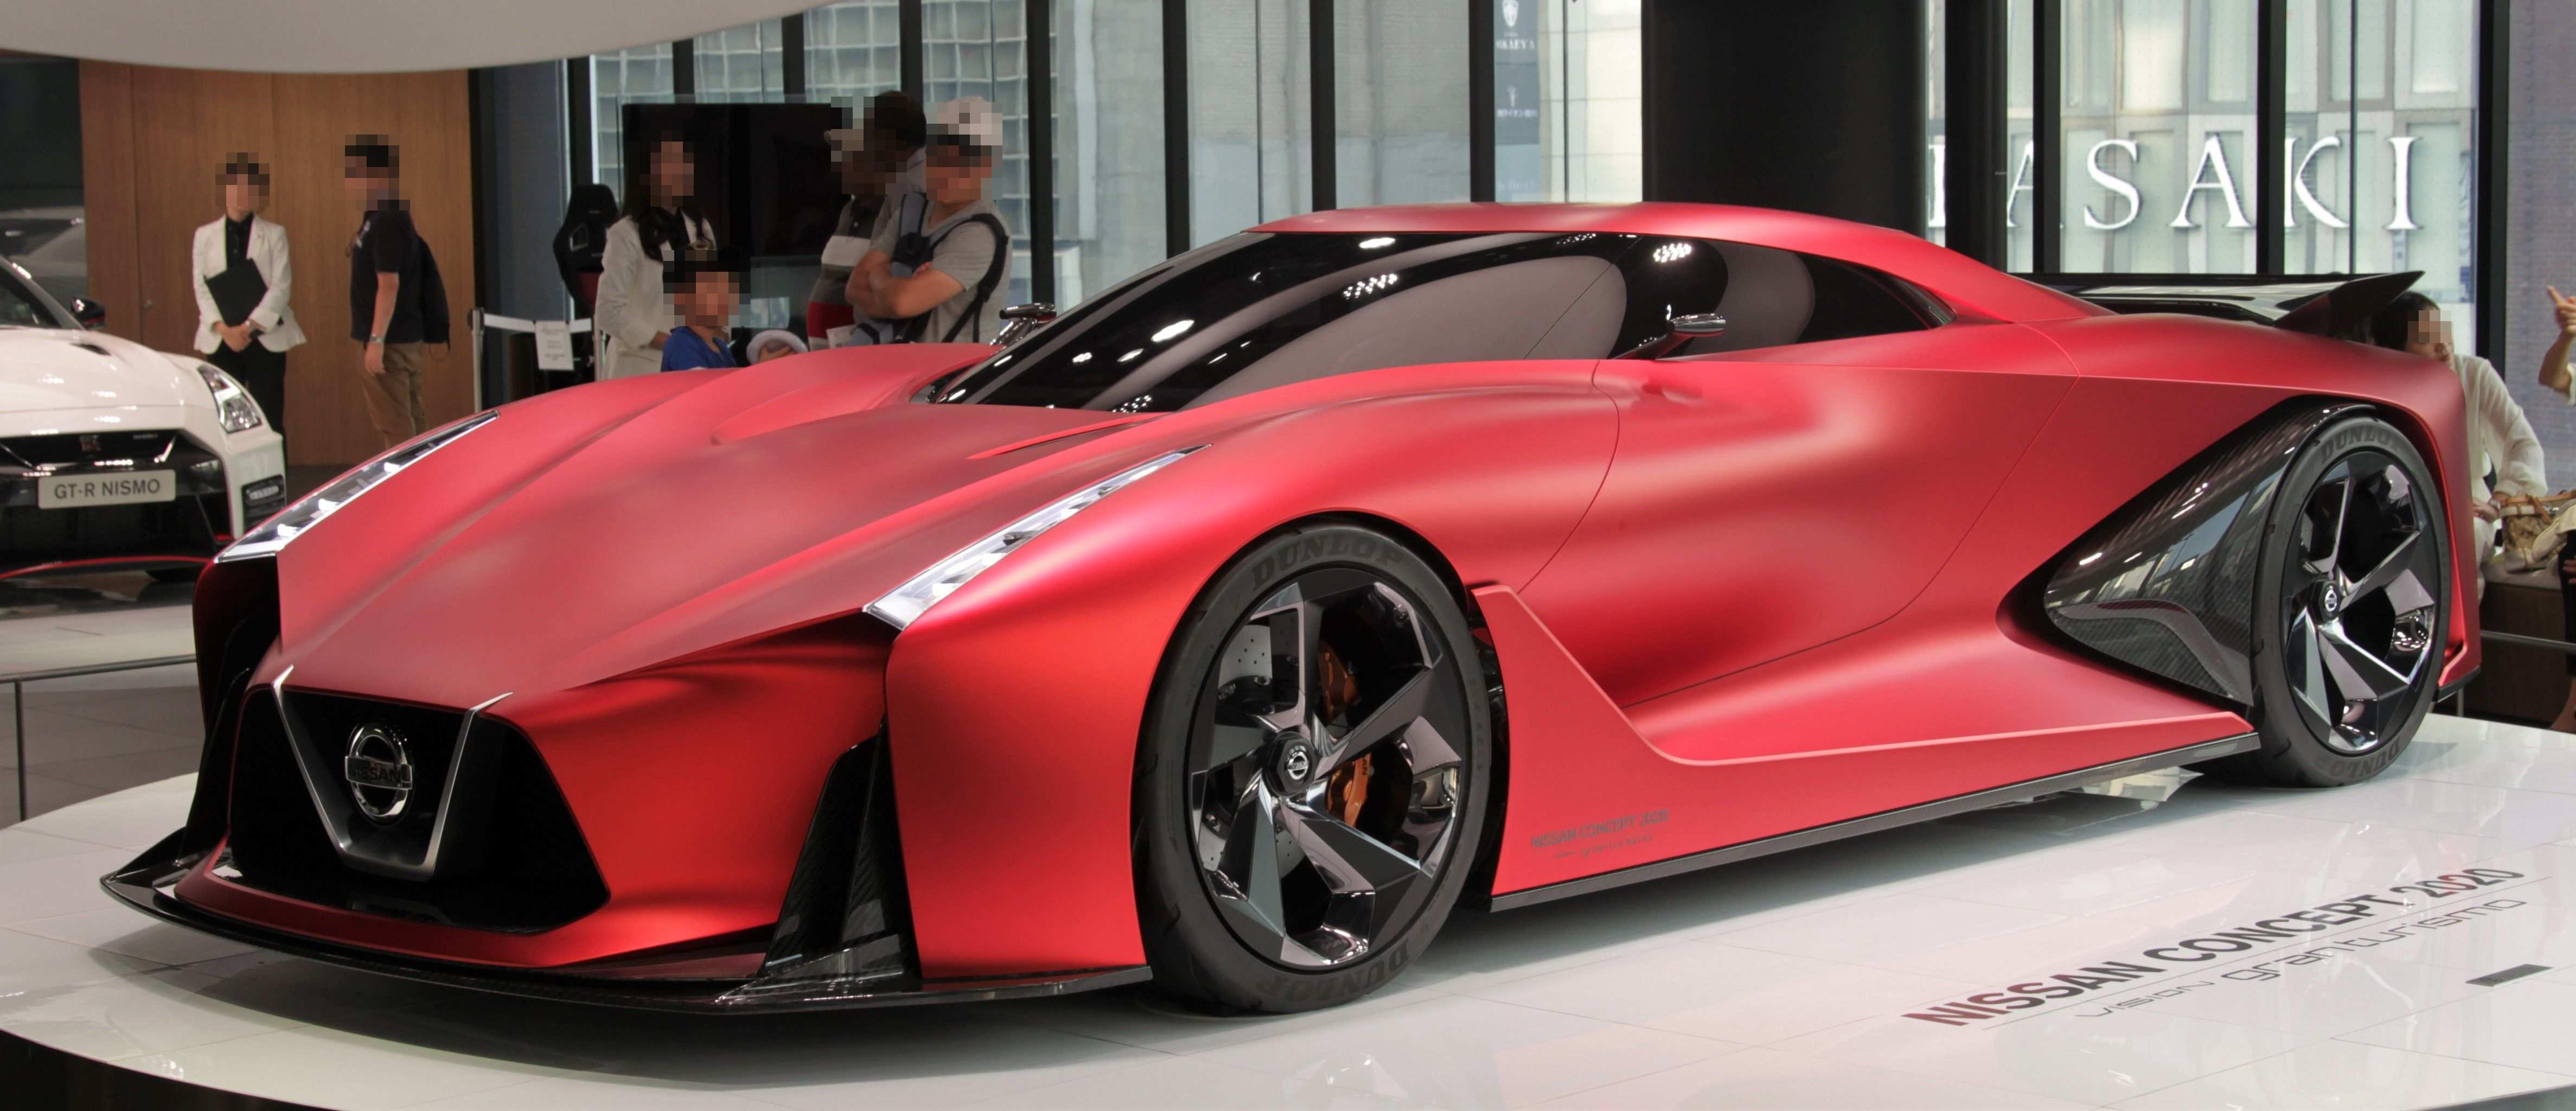 84 Great 2020 Nissan Gran Turismo Prices for 2020 Nissan Gran Turismo